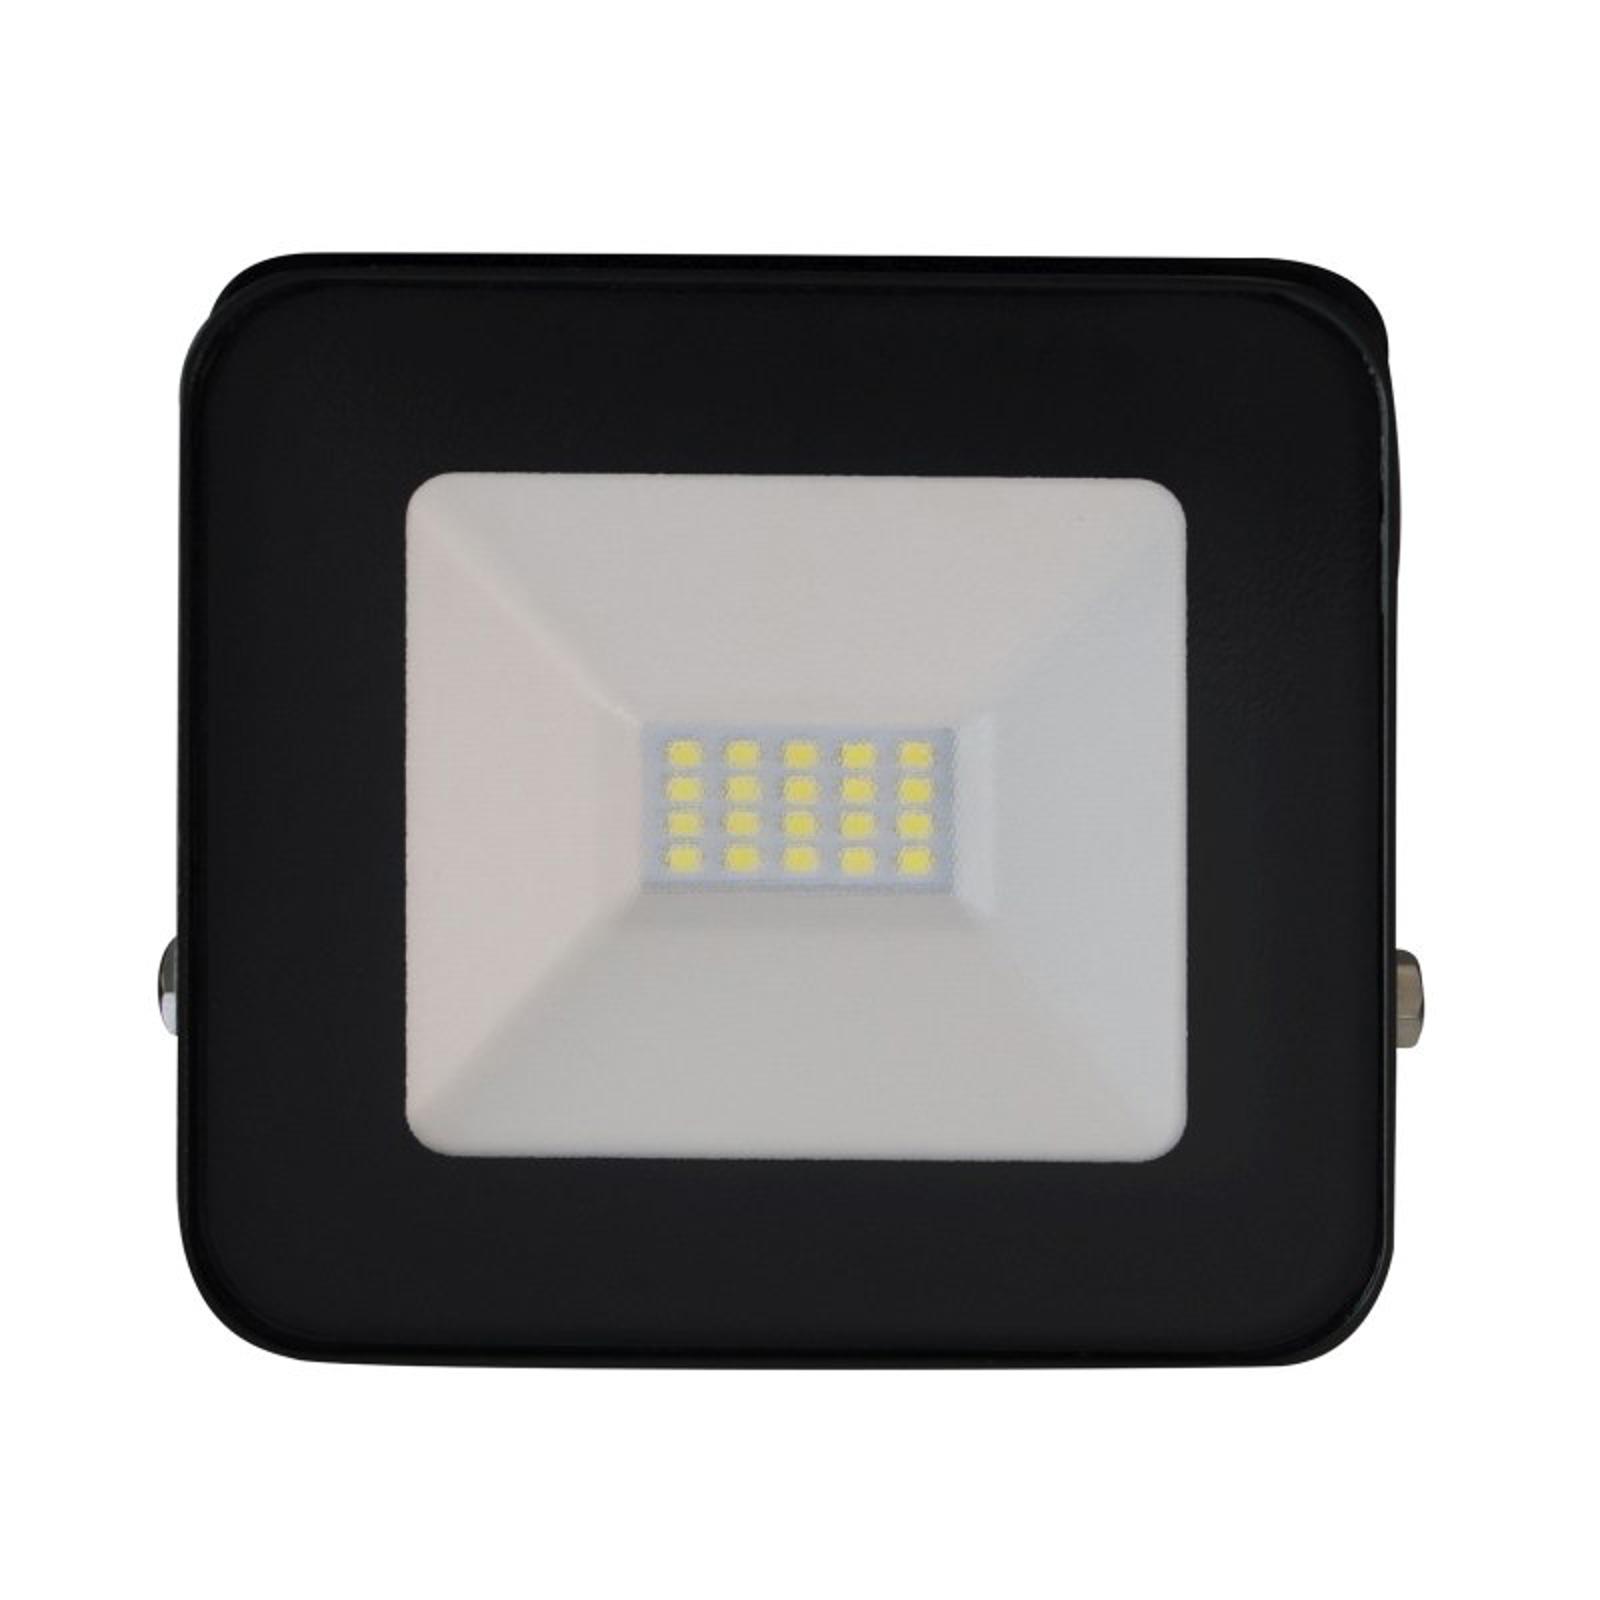 John-LED-kohdevalaisin ulos, musta 30 W